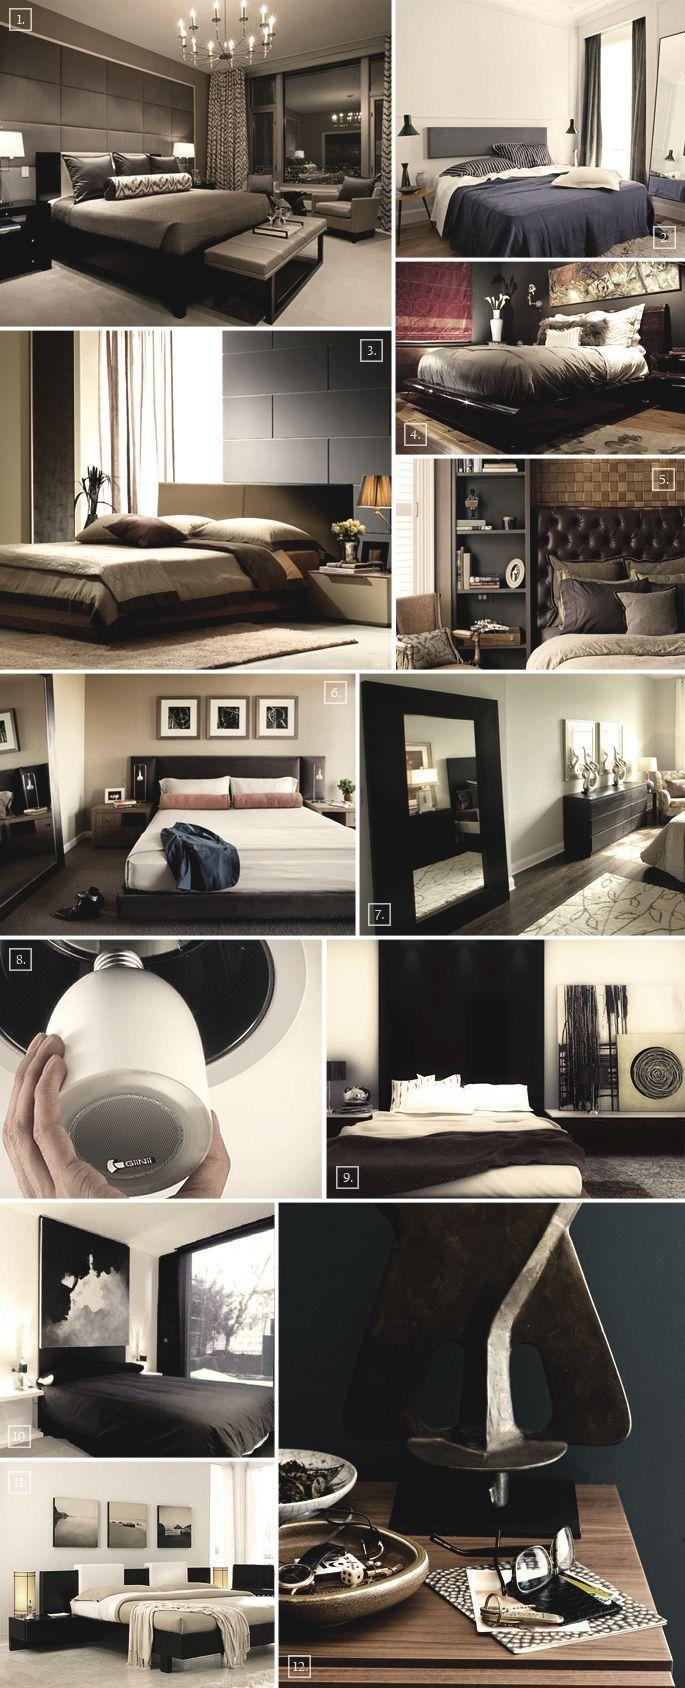 Mens Bedroom Ideas and Designs | Decor styles, Bedroom ...